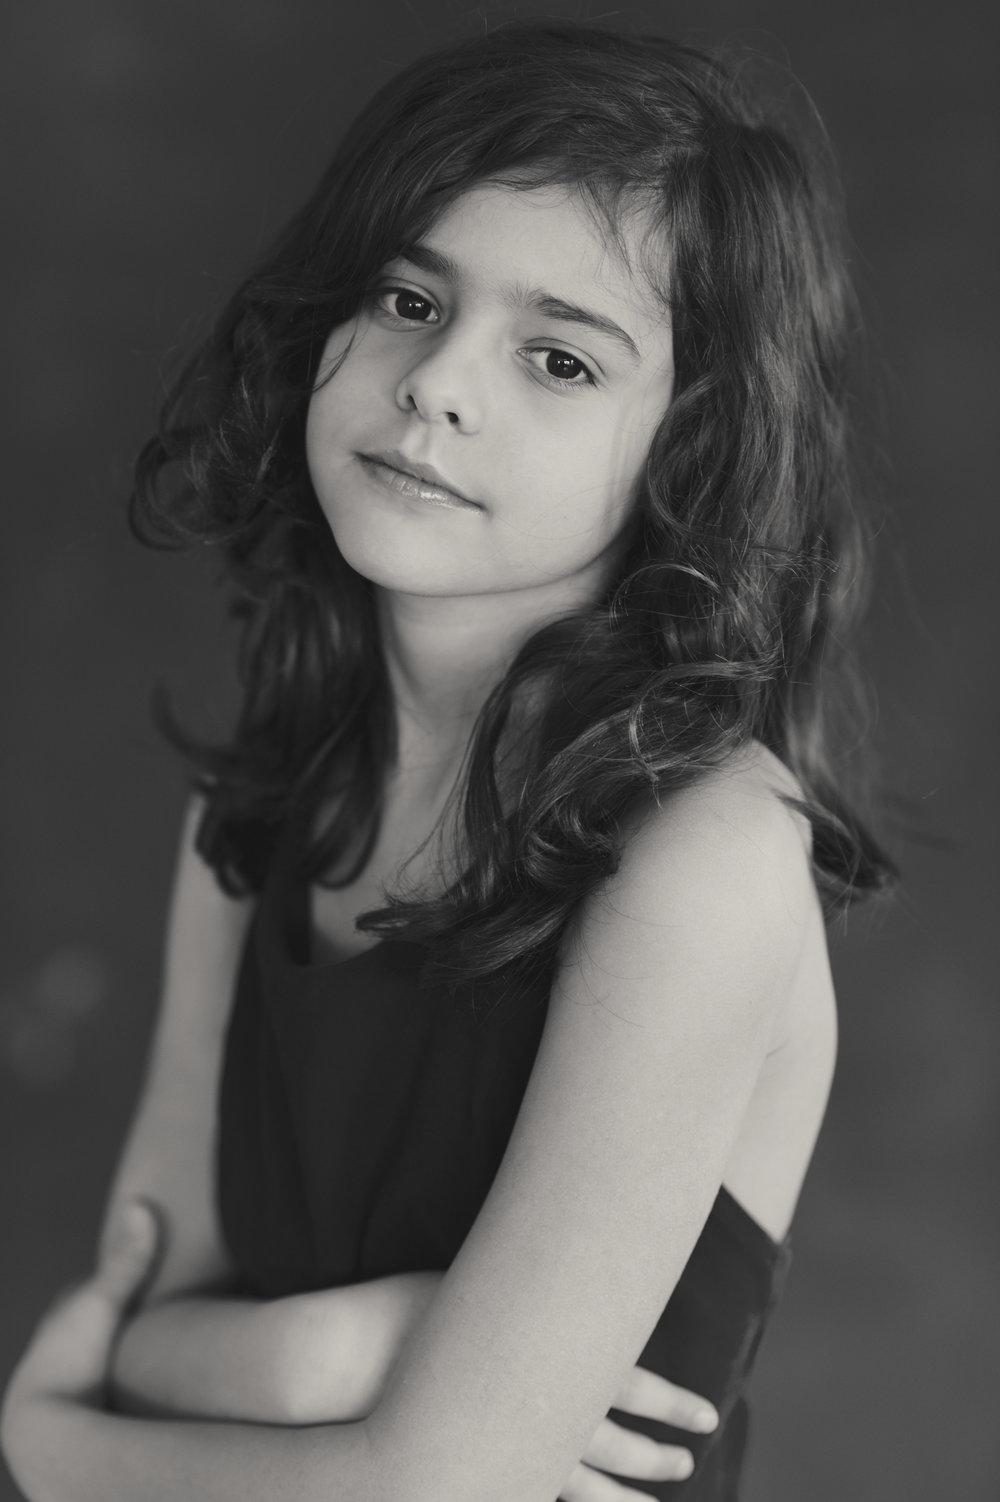 Marta-Hewson-Classical-portrait-young-girl-gentle-smile.jpg